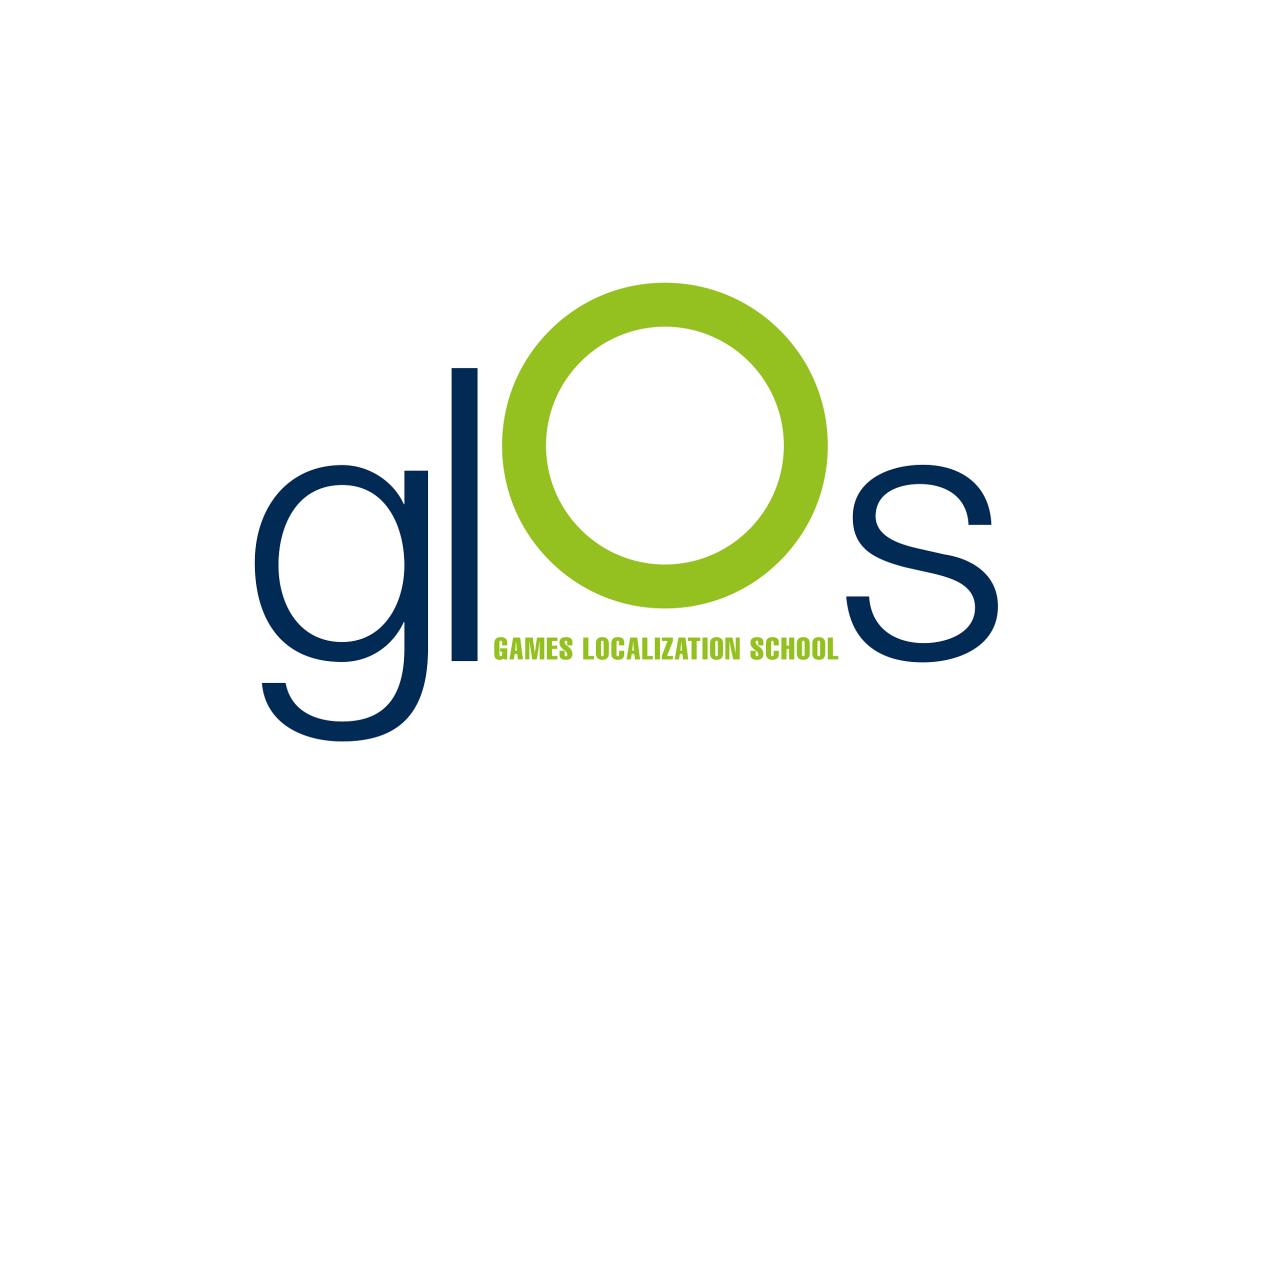 https://vigamus.com/beta/wp-content/uploads/2021/02/GLOS-Logo-1280x1280.png